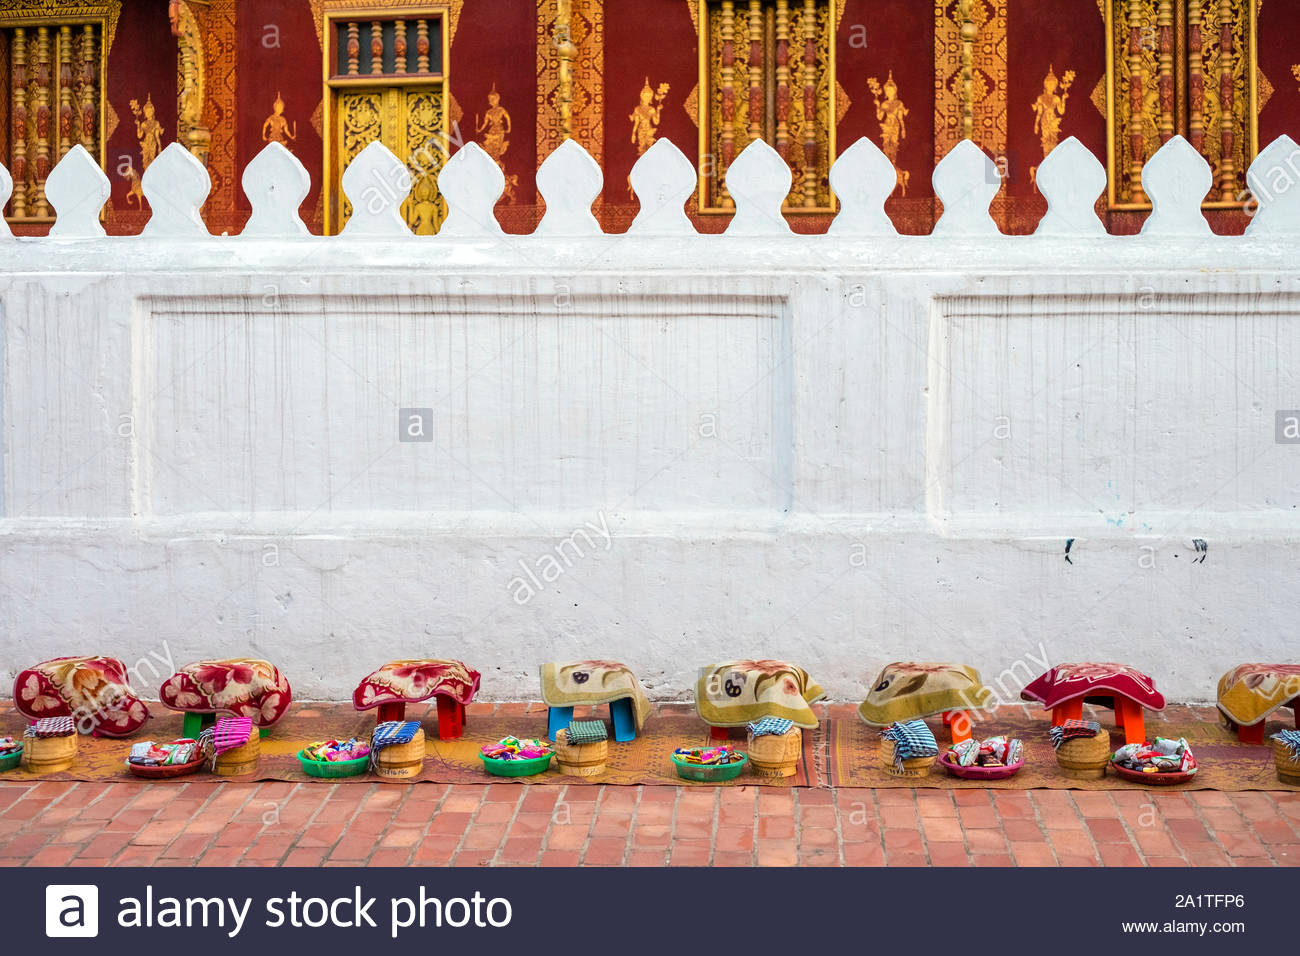 Almsgiving (Tak Bat) in front of Wat Sene Souk Haram temple, Luang Prabang, Louangphabang Province, Laos Stock Photo